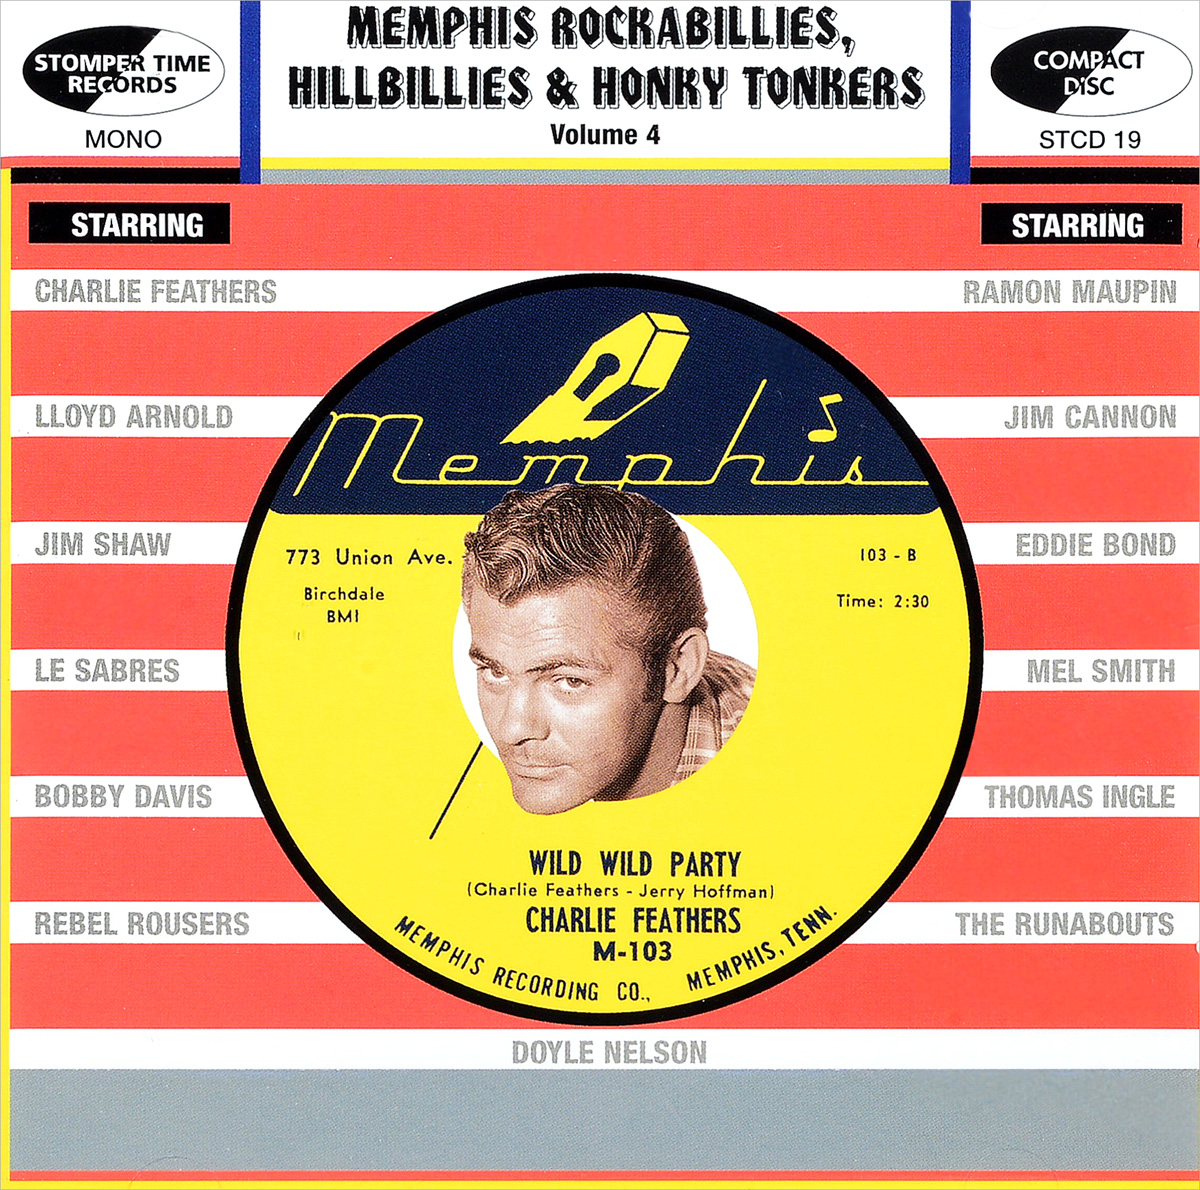 Memphis Rockabillies, Hillbillies & Honky Tonkers. Volume 4: Memphis Records (4 CD) thunderbolts volume 4